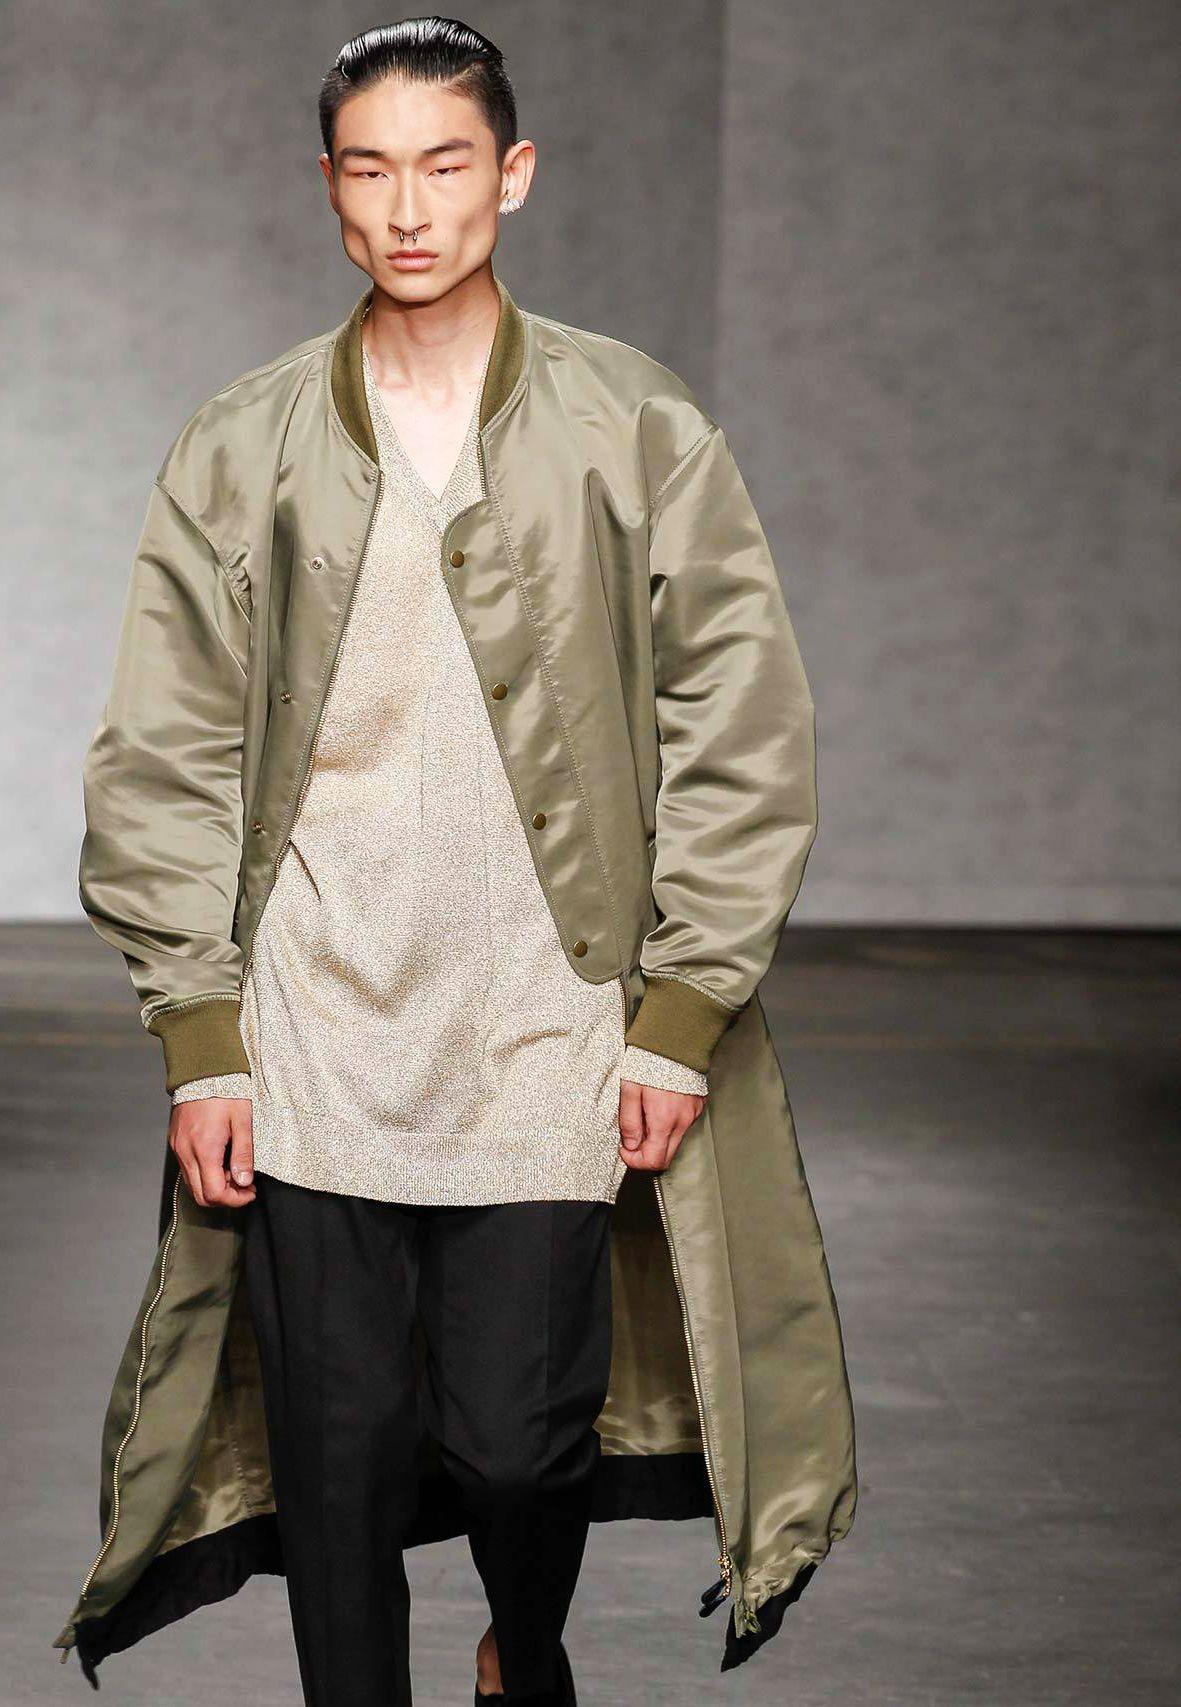 Casely Hayford SS15 SANG WOO KIM Streetwear homme, Mode